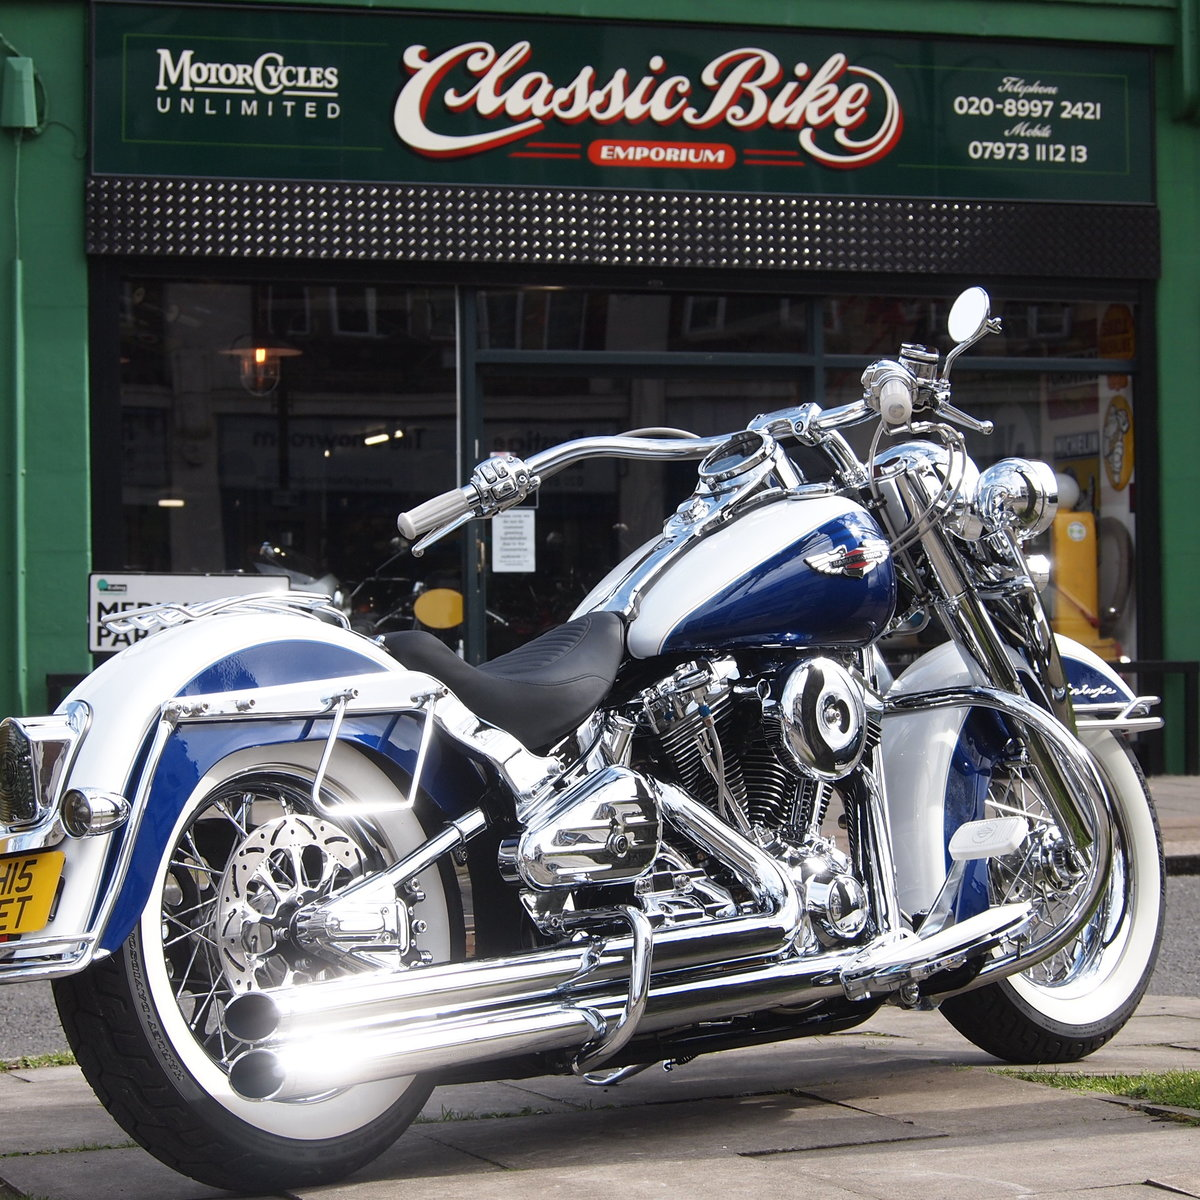 2008 Harley Davidson FLSTN Deluxe, RESERVED FOR FLEMMING. SOLD (picture 1 of 6)